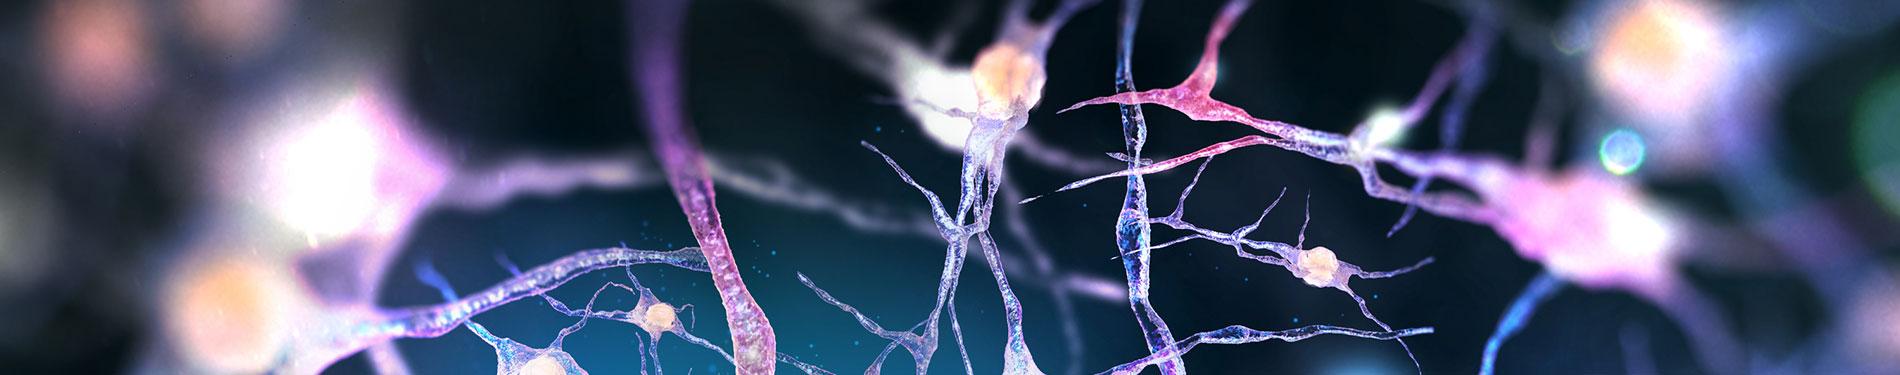 Objectively assesses the full spectrum of brain injury